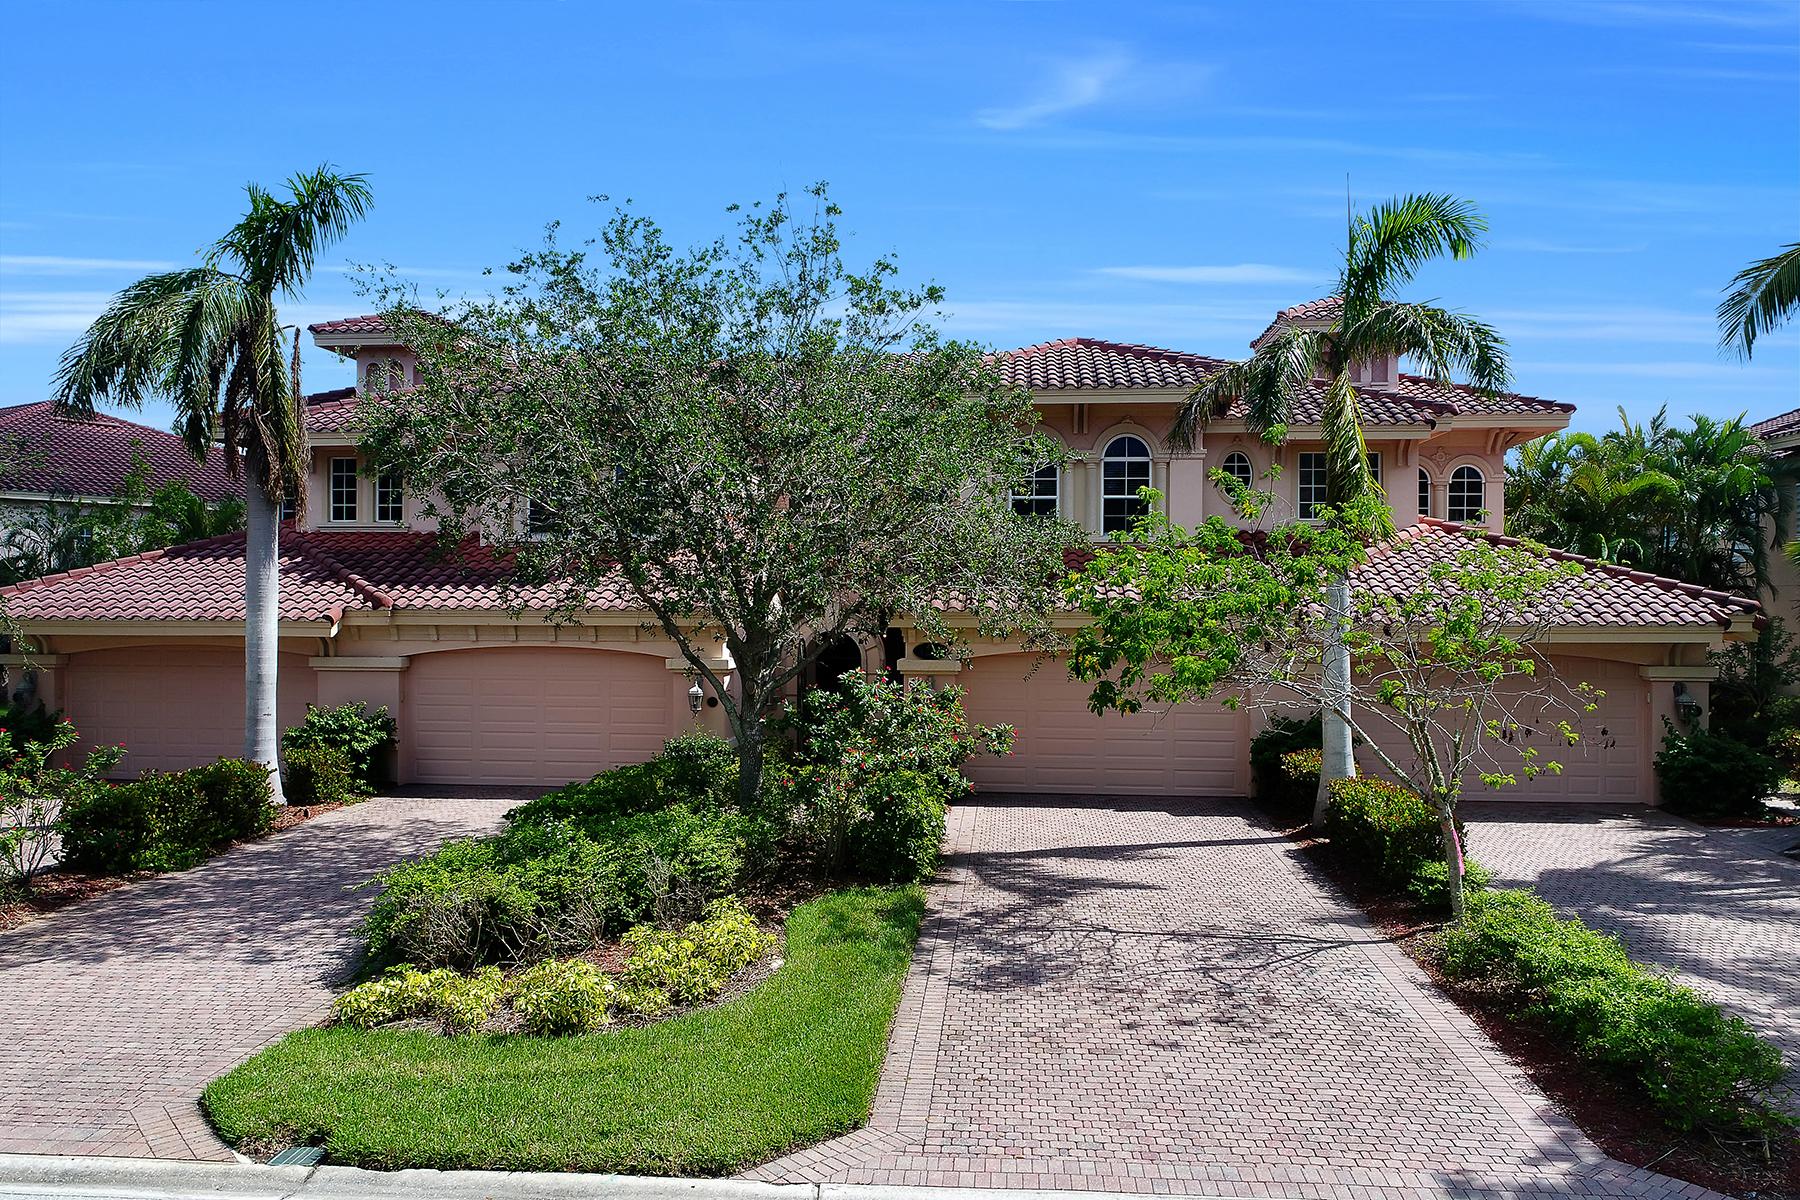 Condominium for Sale at FIDDLERS CREEK 3202 Serenity Ct 102, Naples, Florida, 34114 United States